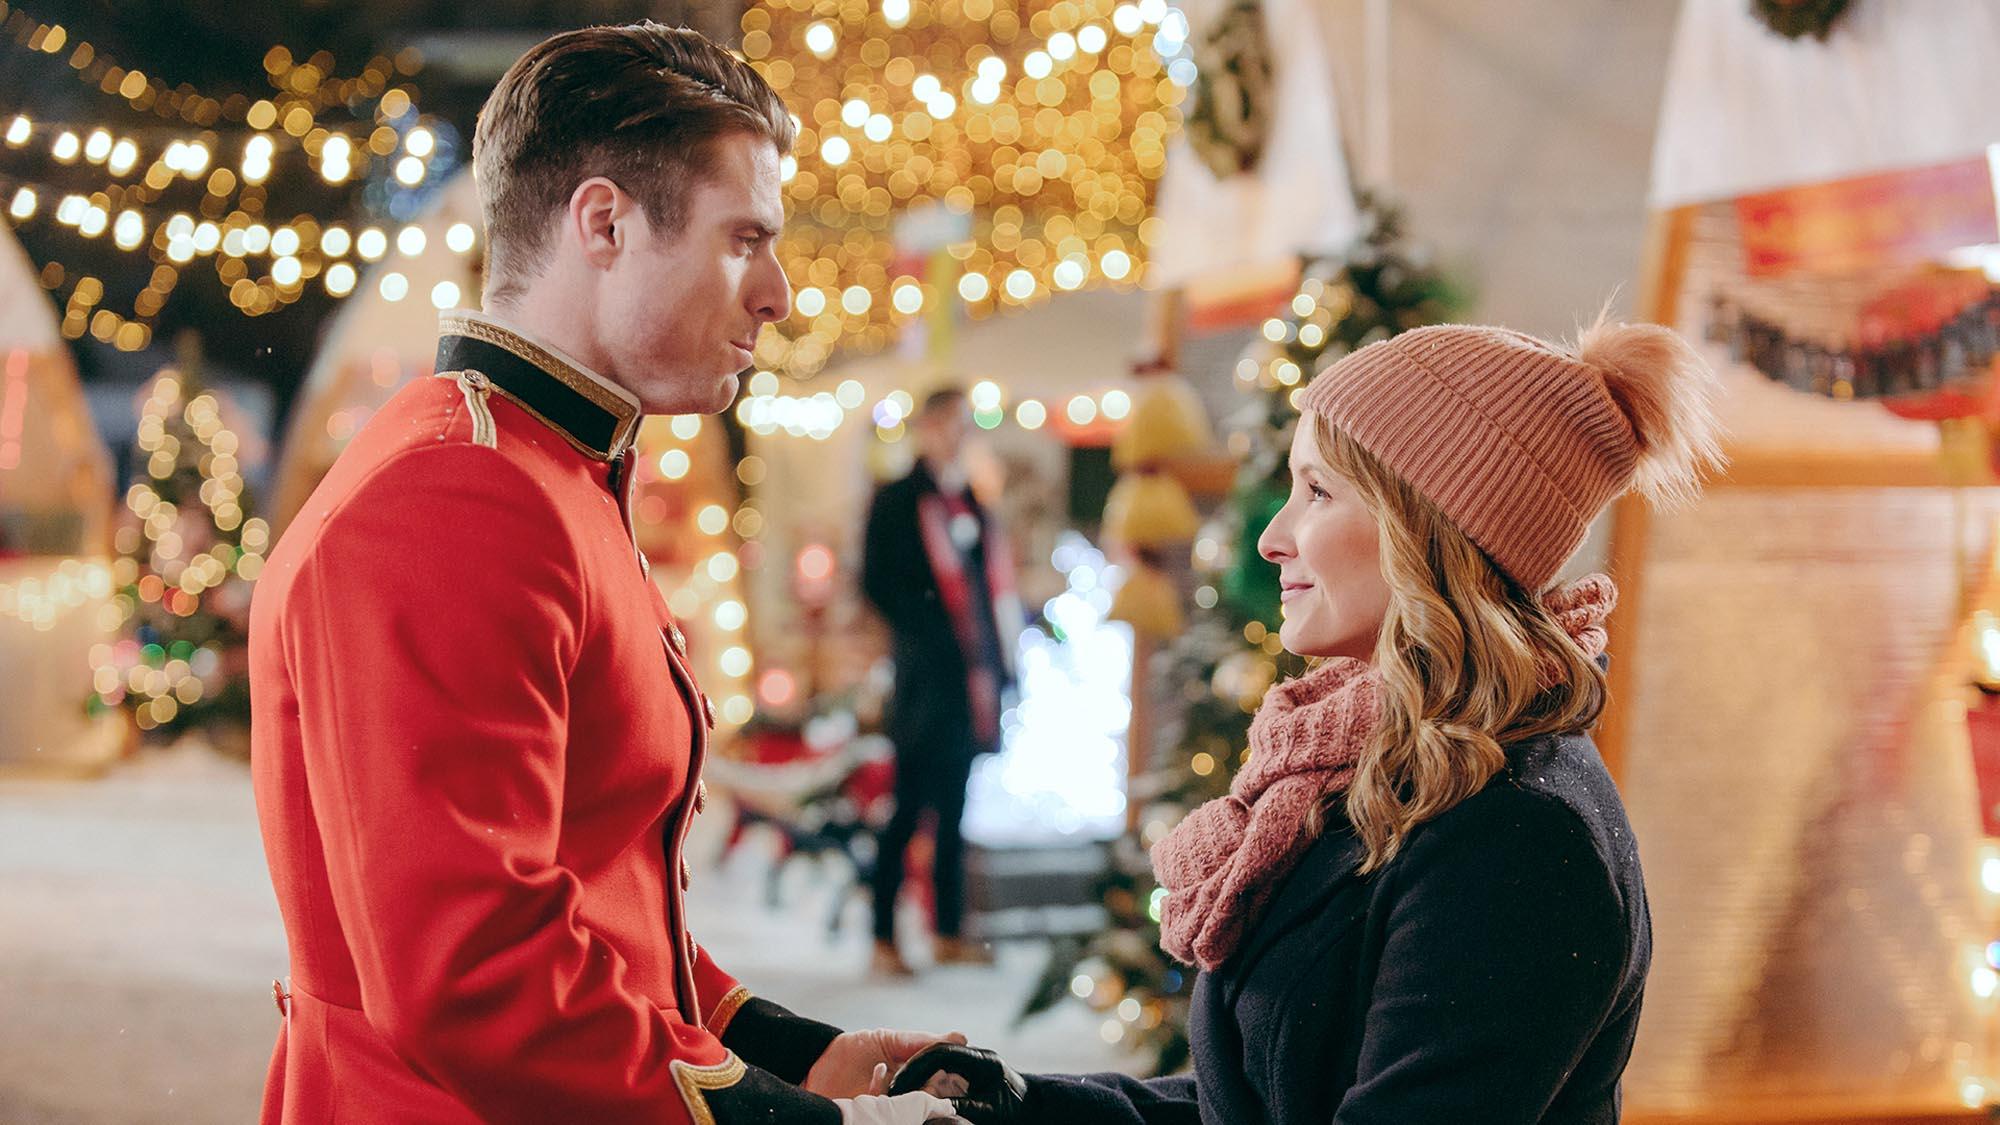 2021 Lifetime Christmas Movies - Christmas with a Crown